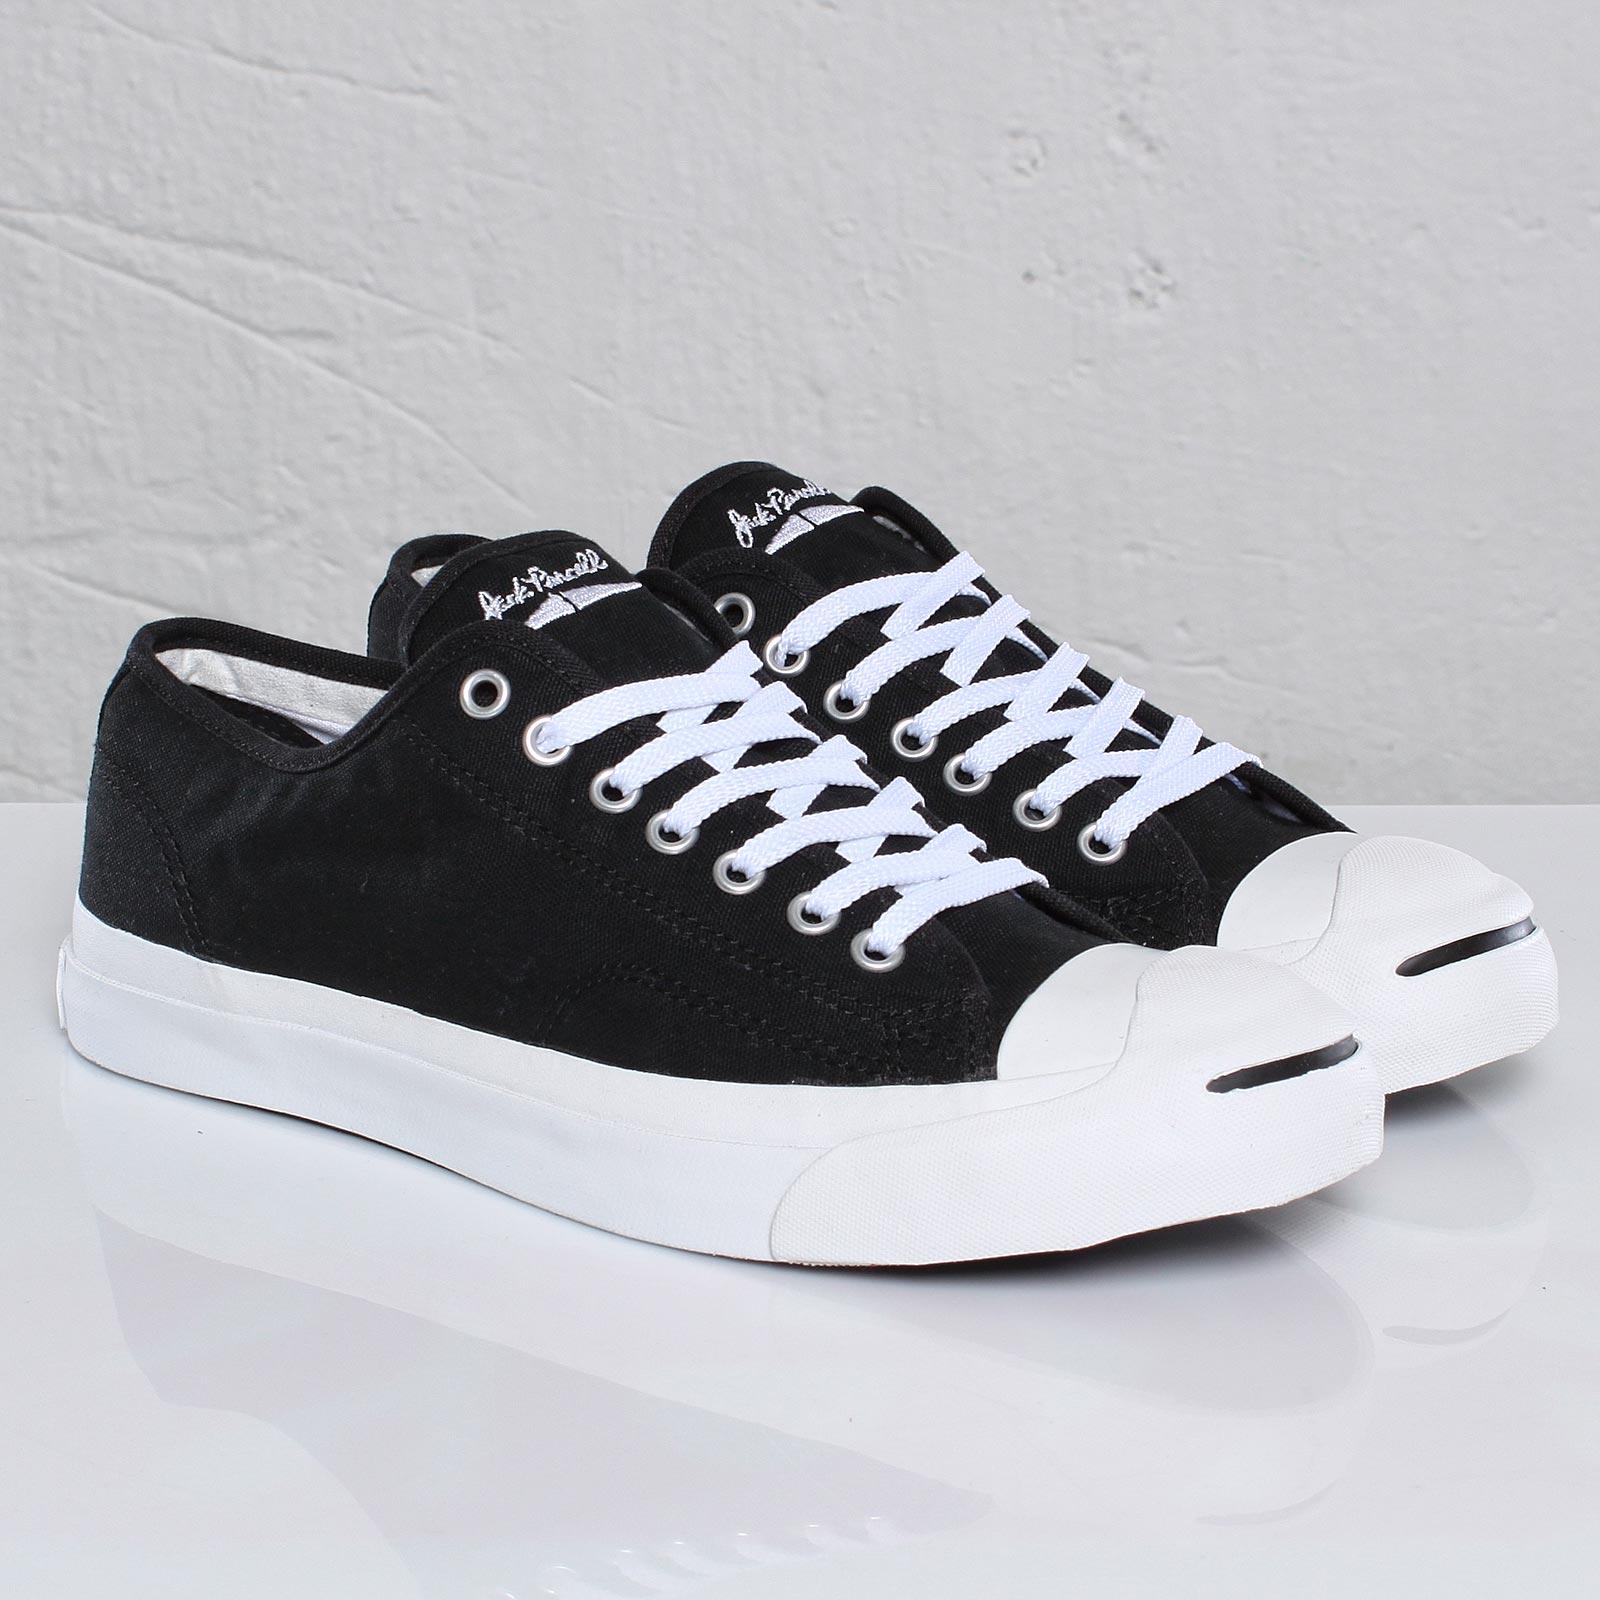 ... unisex converse lifestyle shoes casual shoes 155622c d75fe e46ea italy converse  jack purcell cp ox d8905 17349 ... 46444d3c4